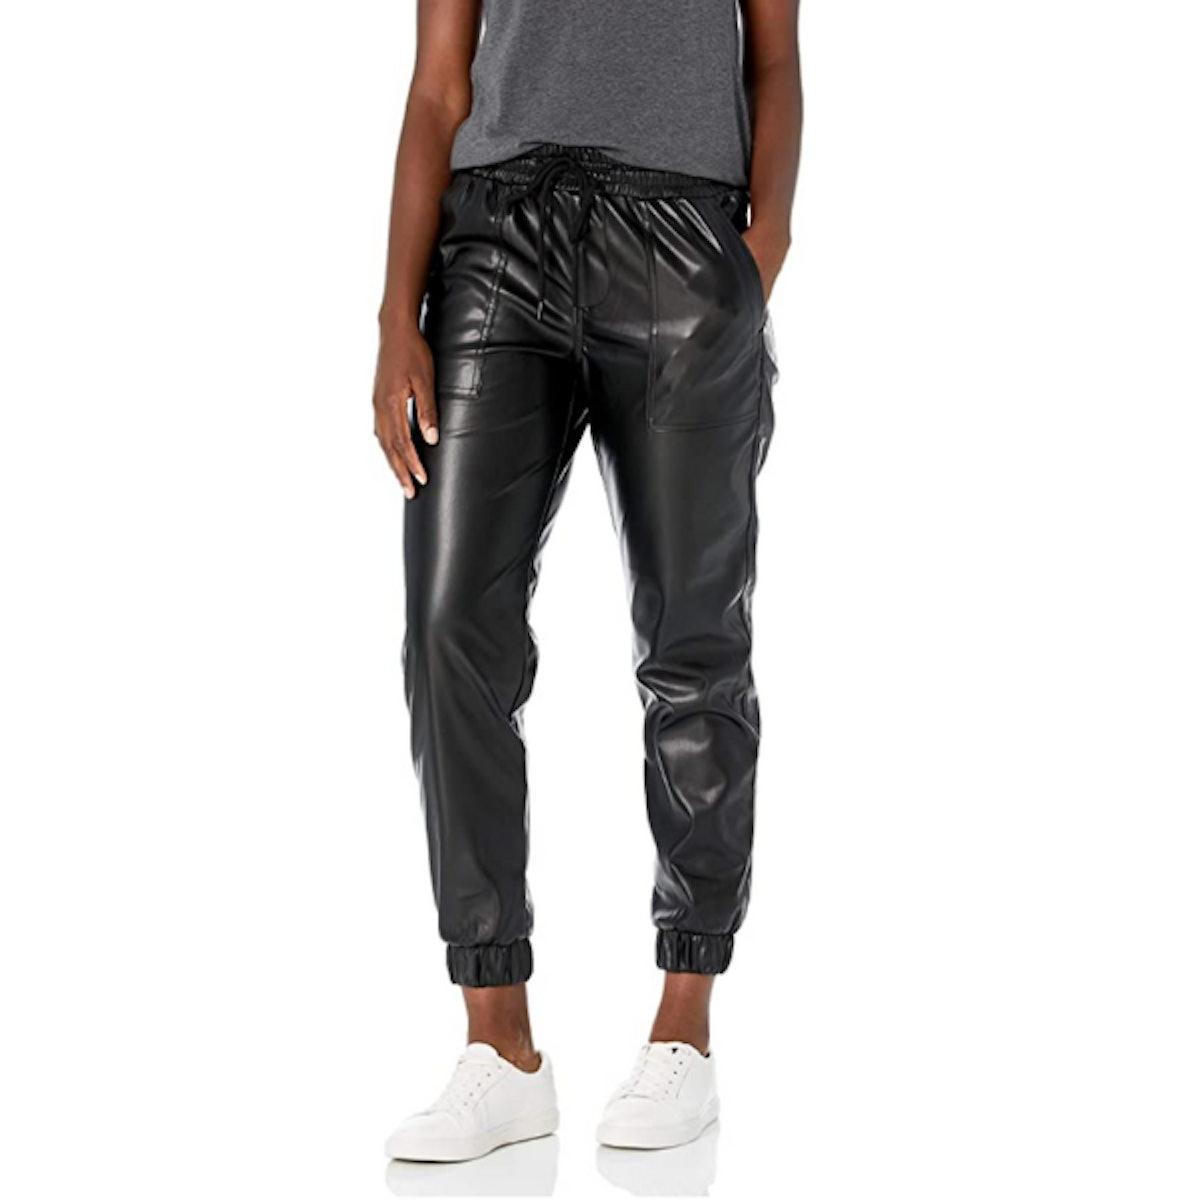 [BLANKNYC] Patch Pocket Jogger Pants